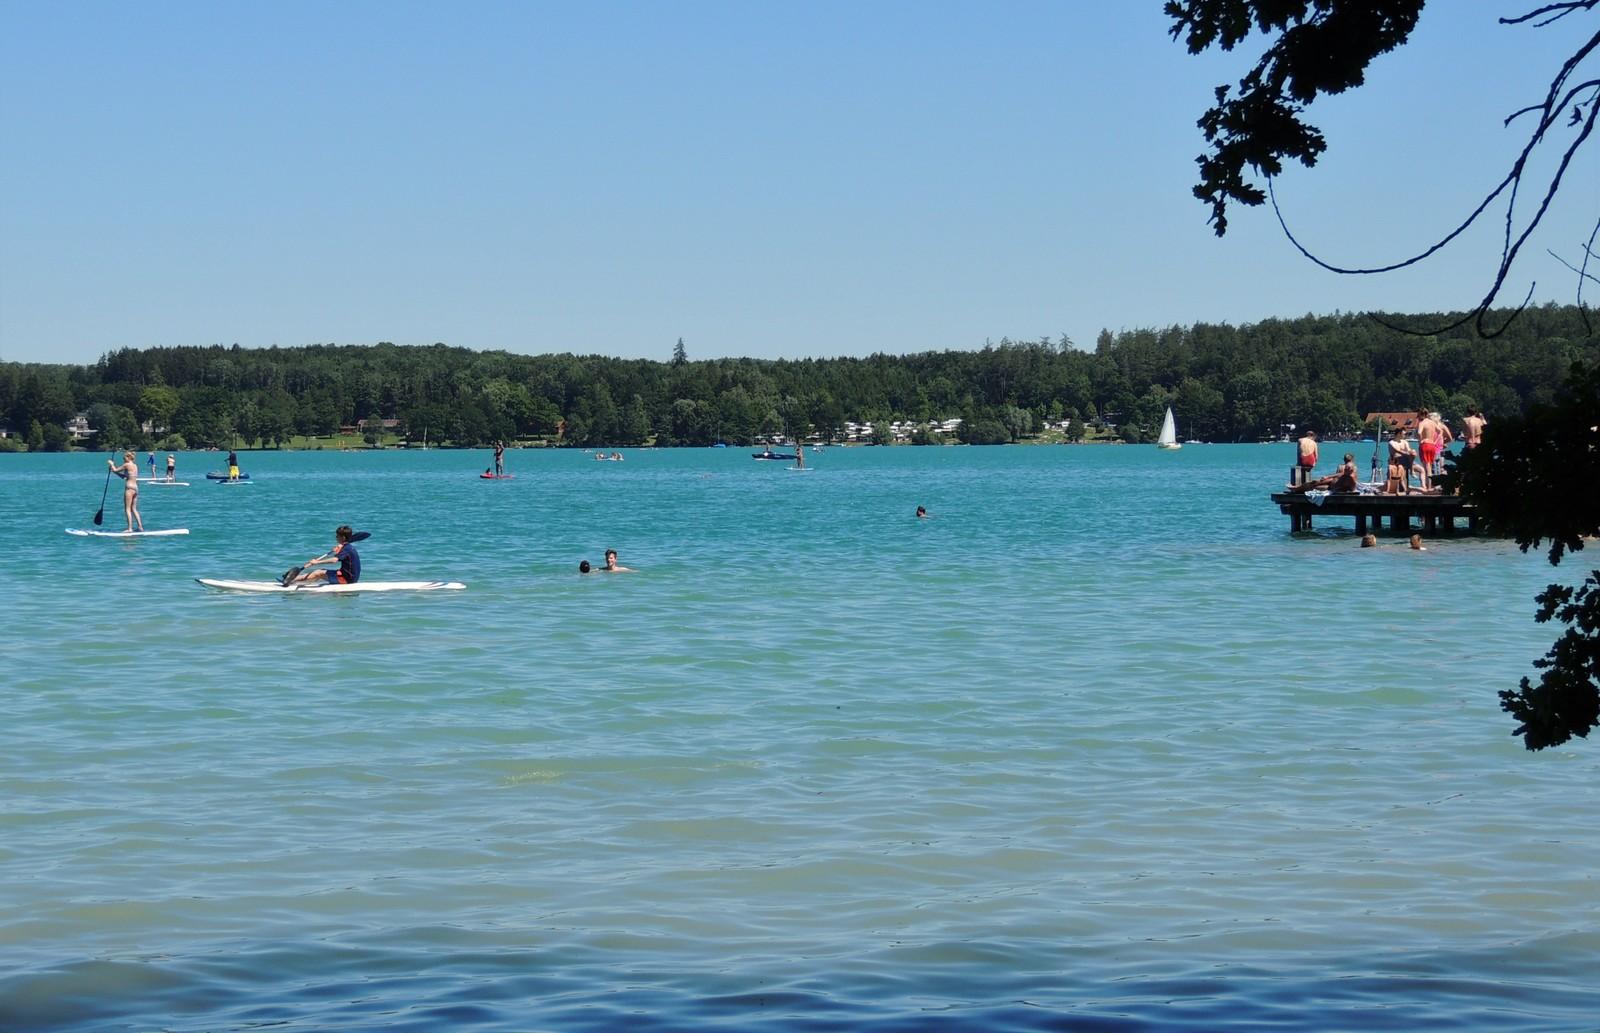 Fünf-Seen-Land - Wörthsee